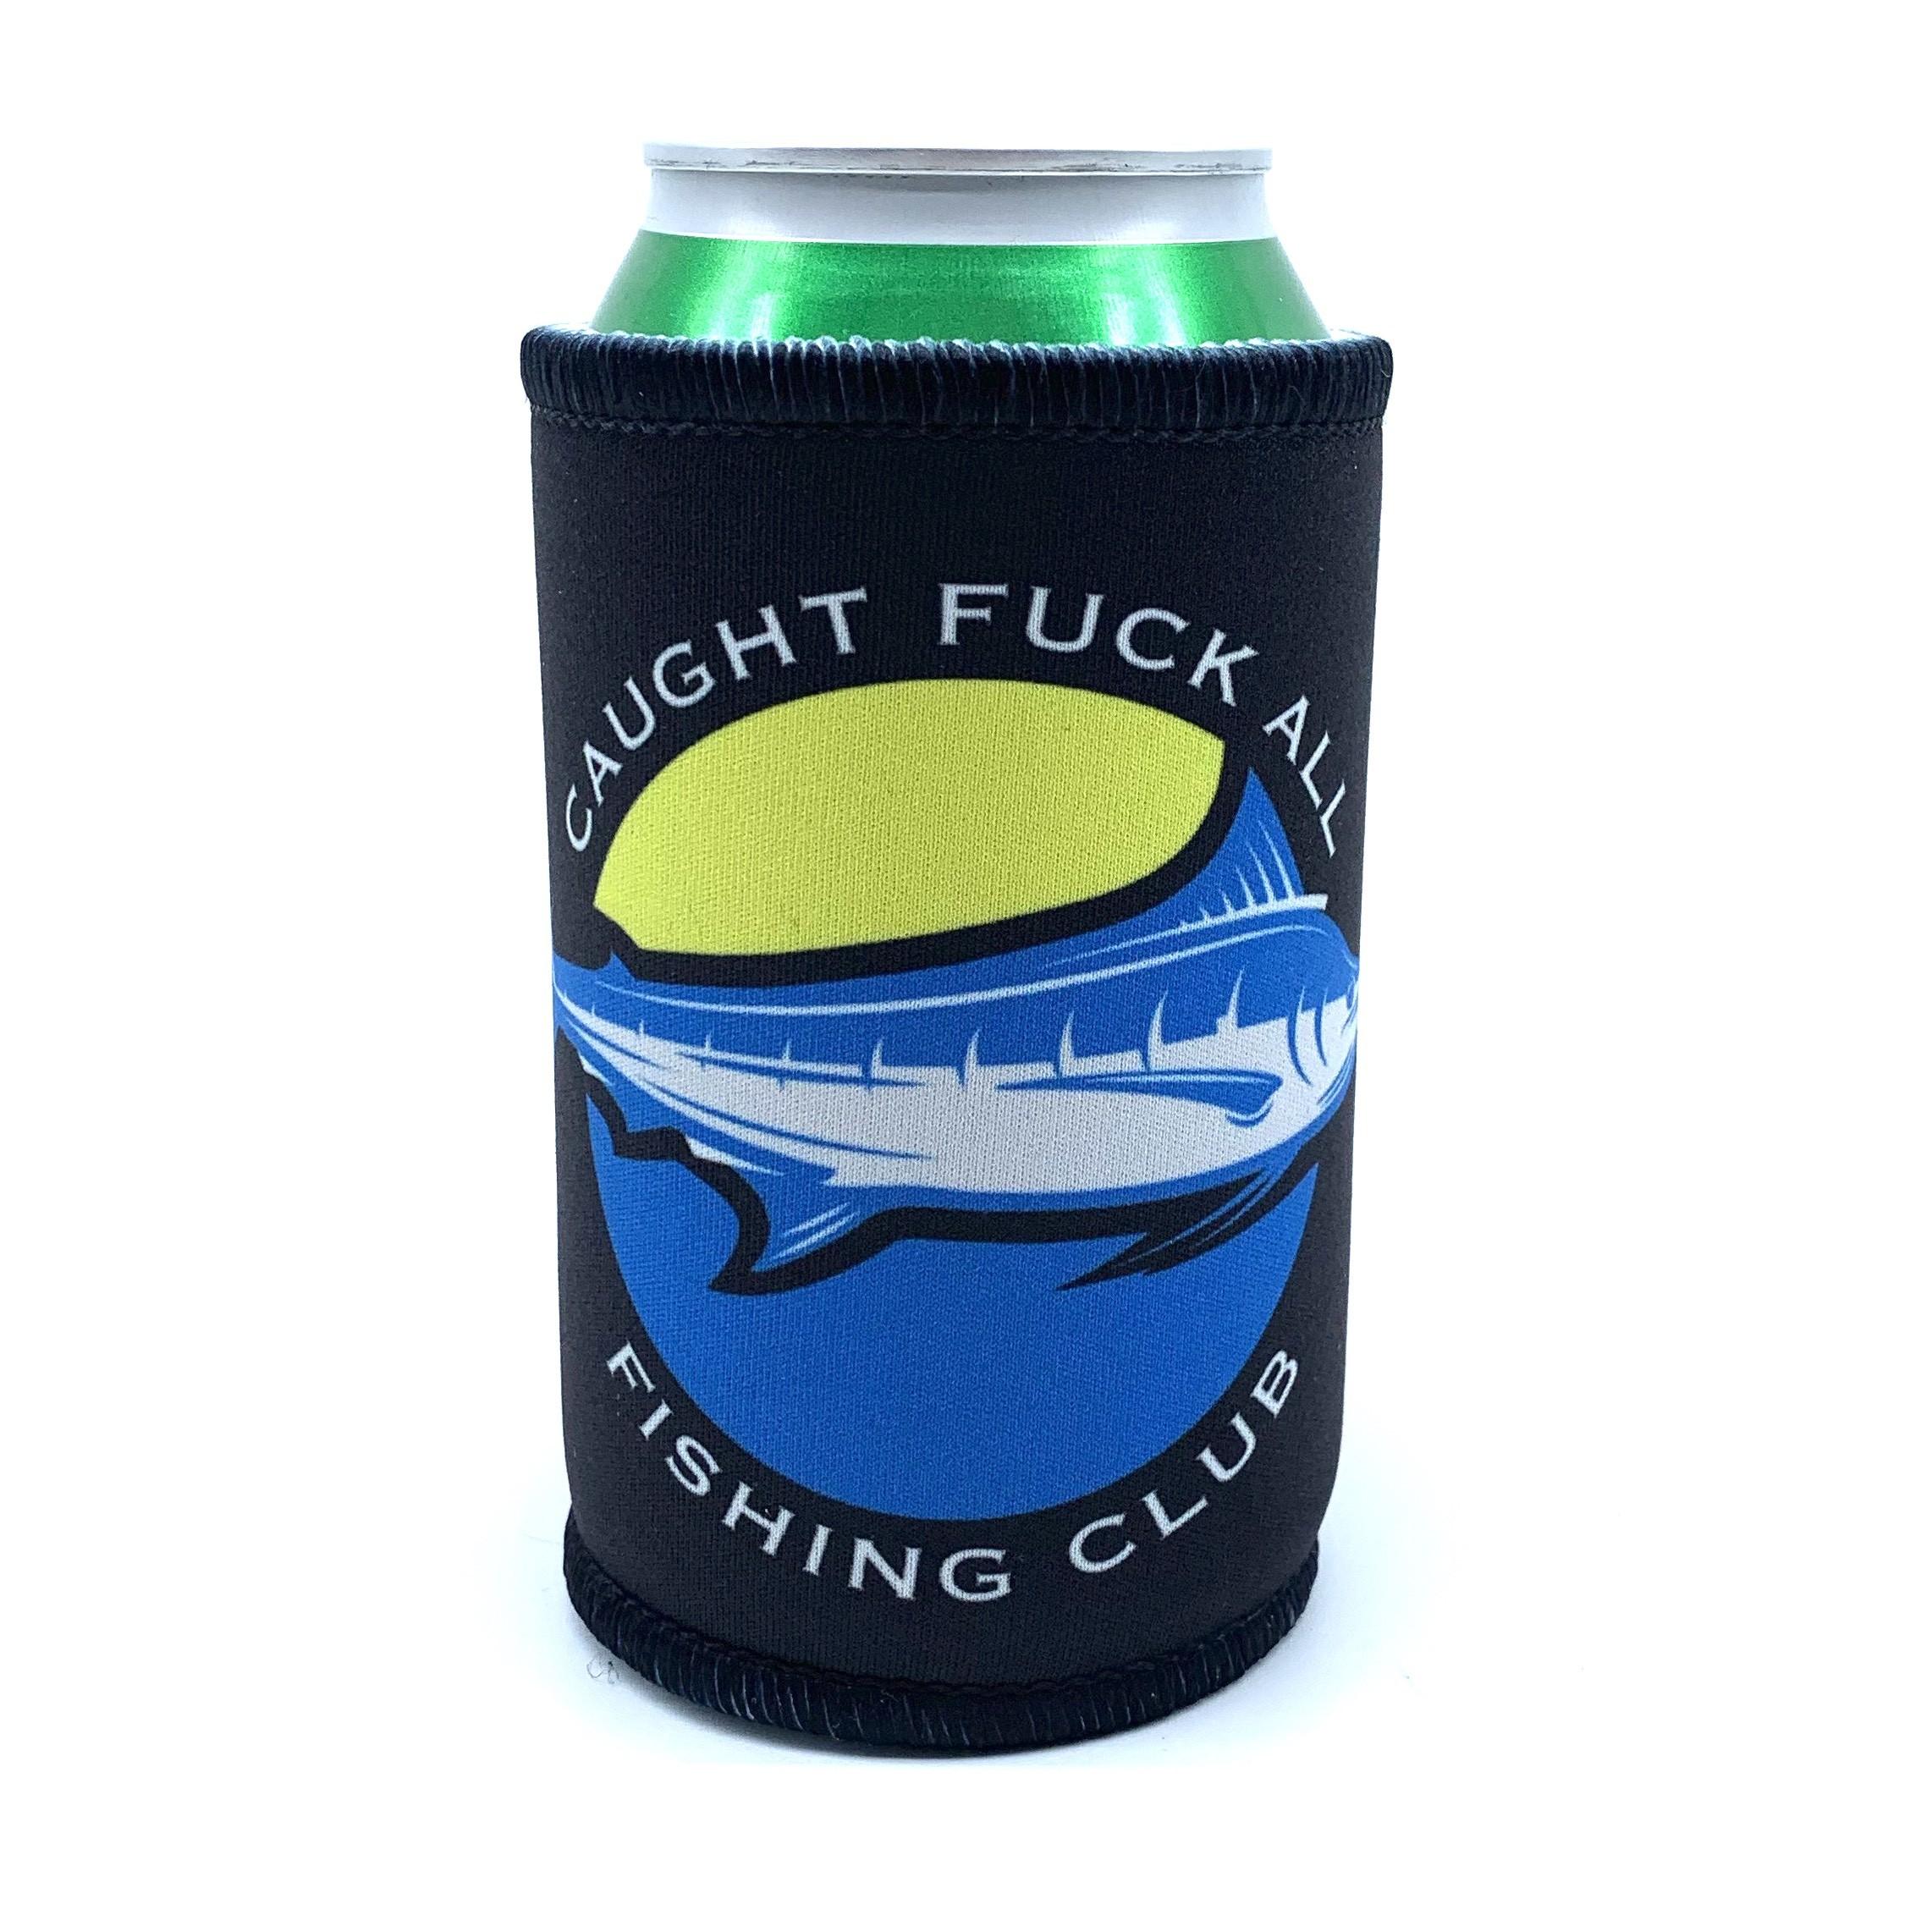 FISHING CLUB STUBBY HOLDER